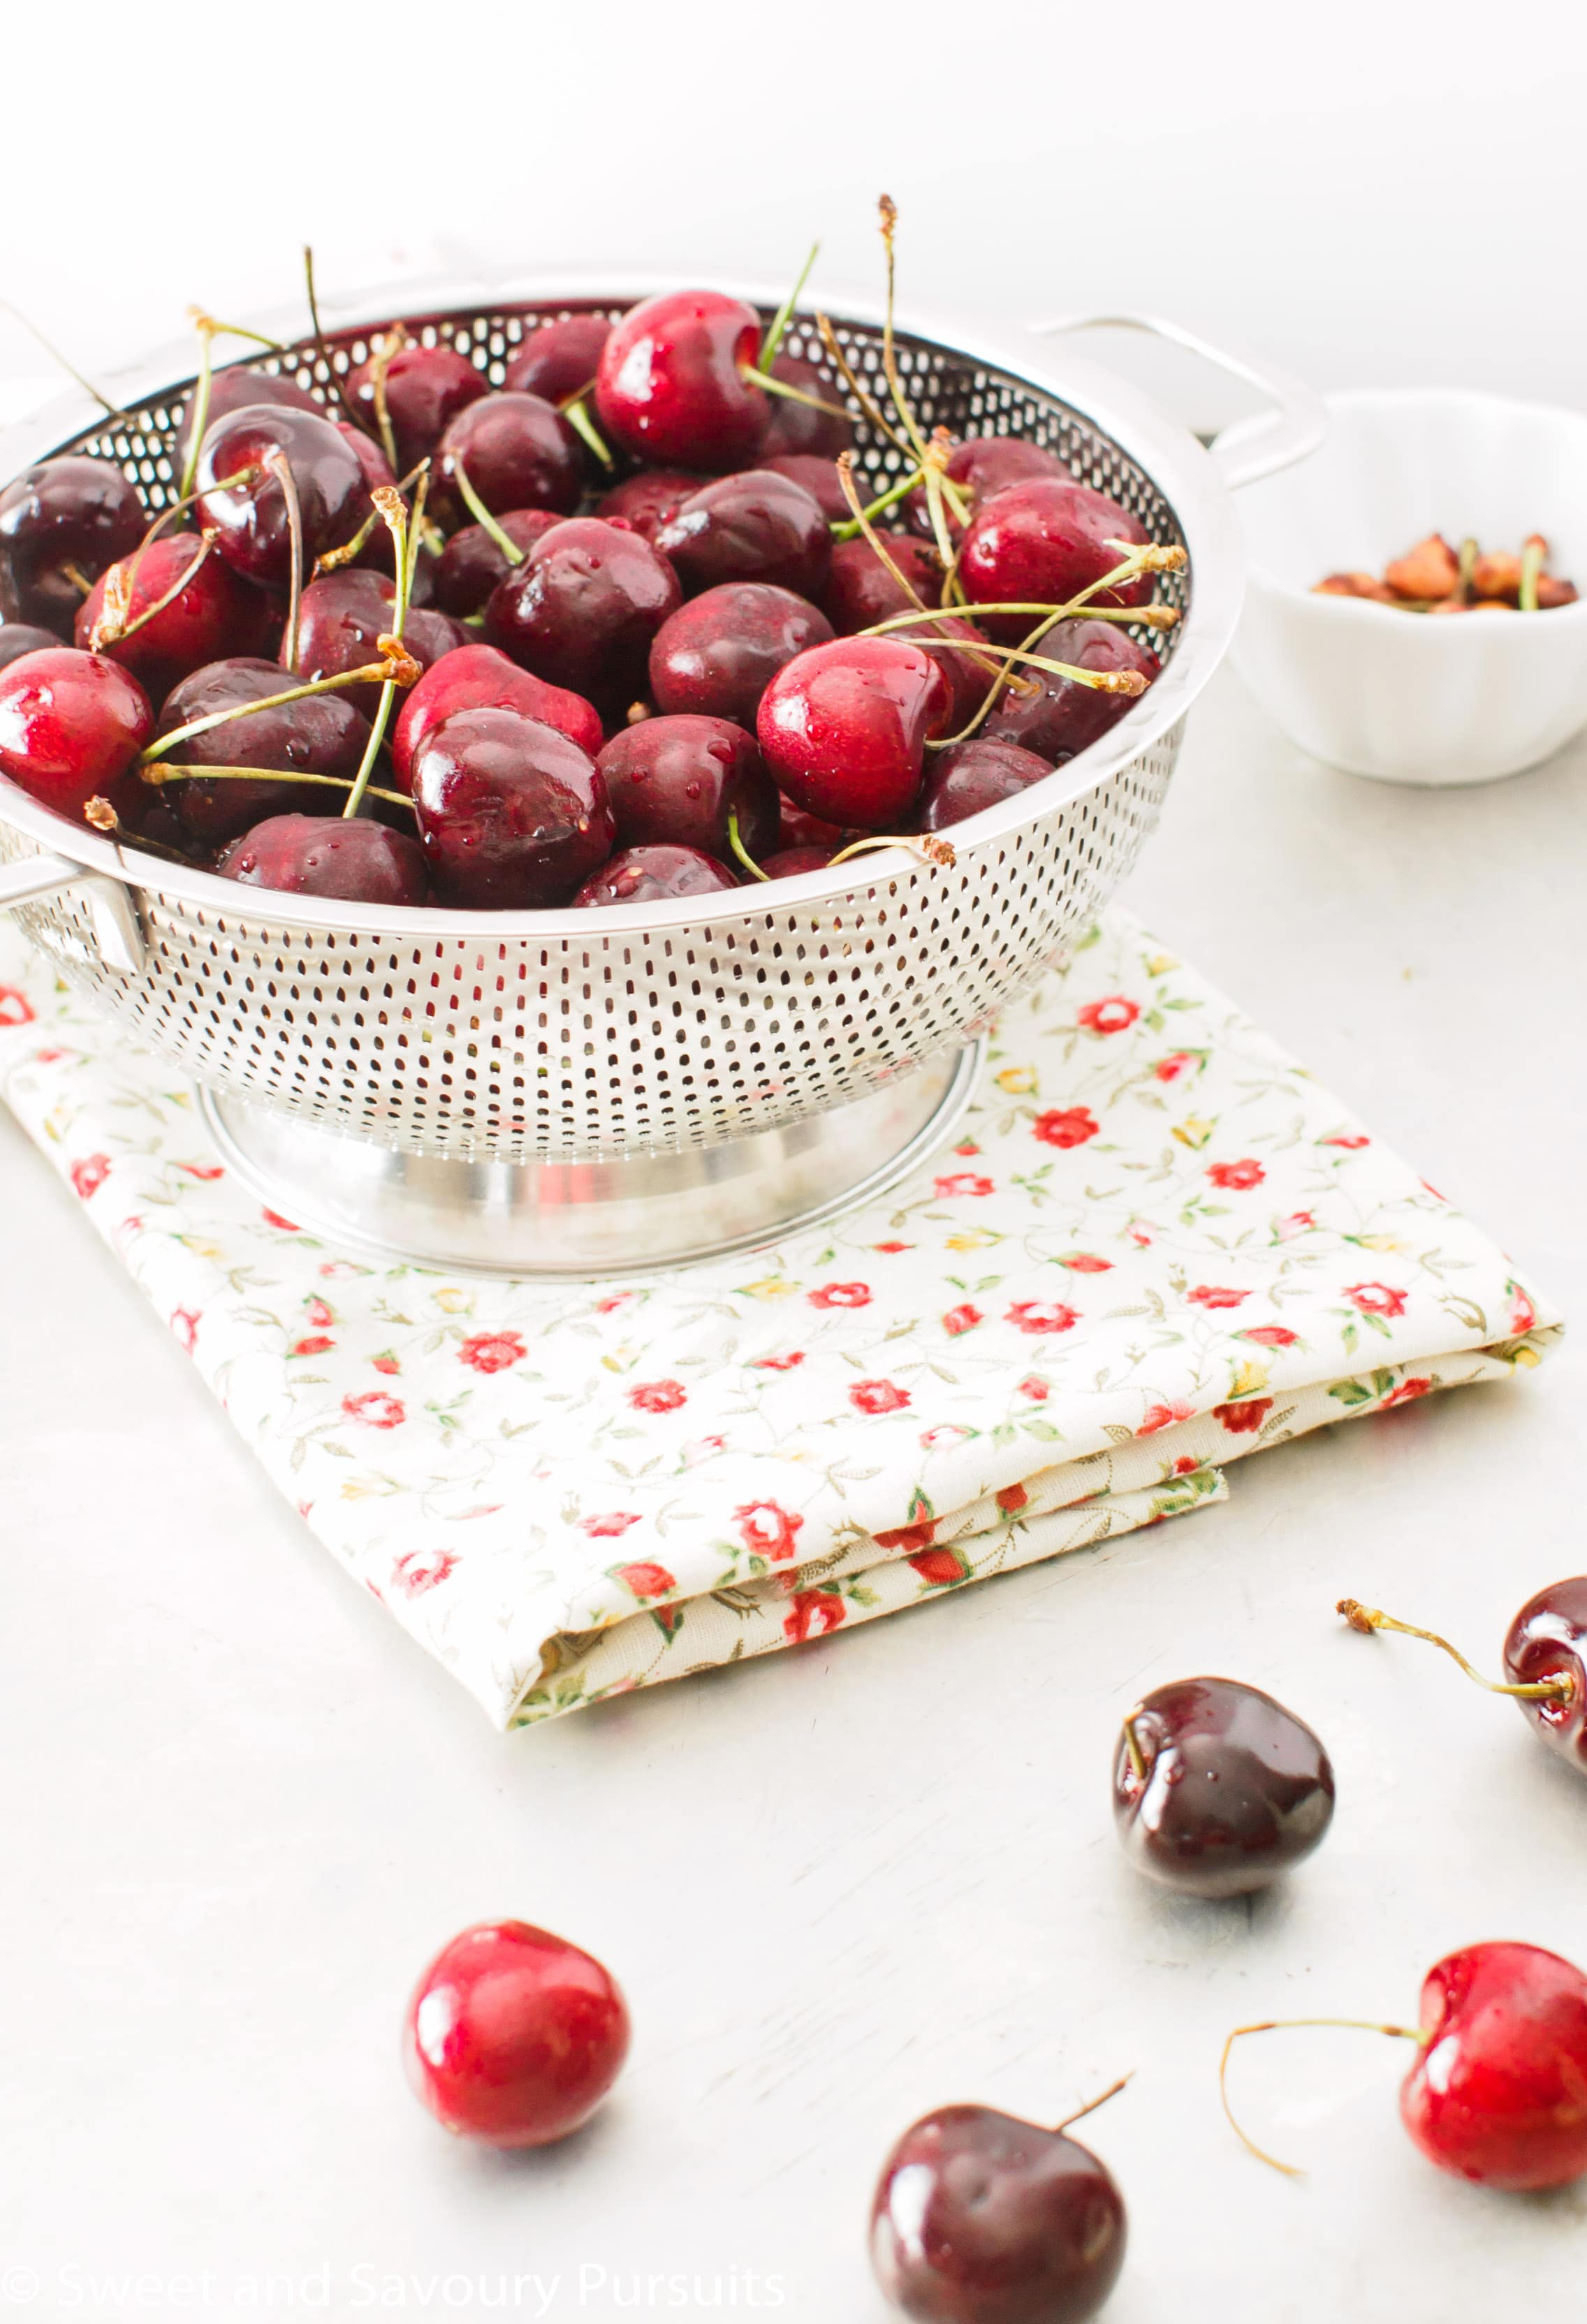 Colander full of freshly washed cherries.